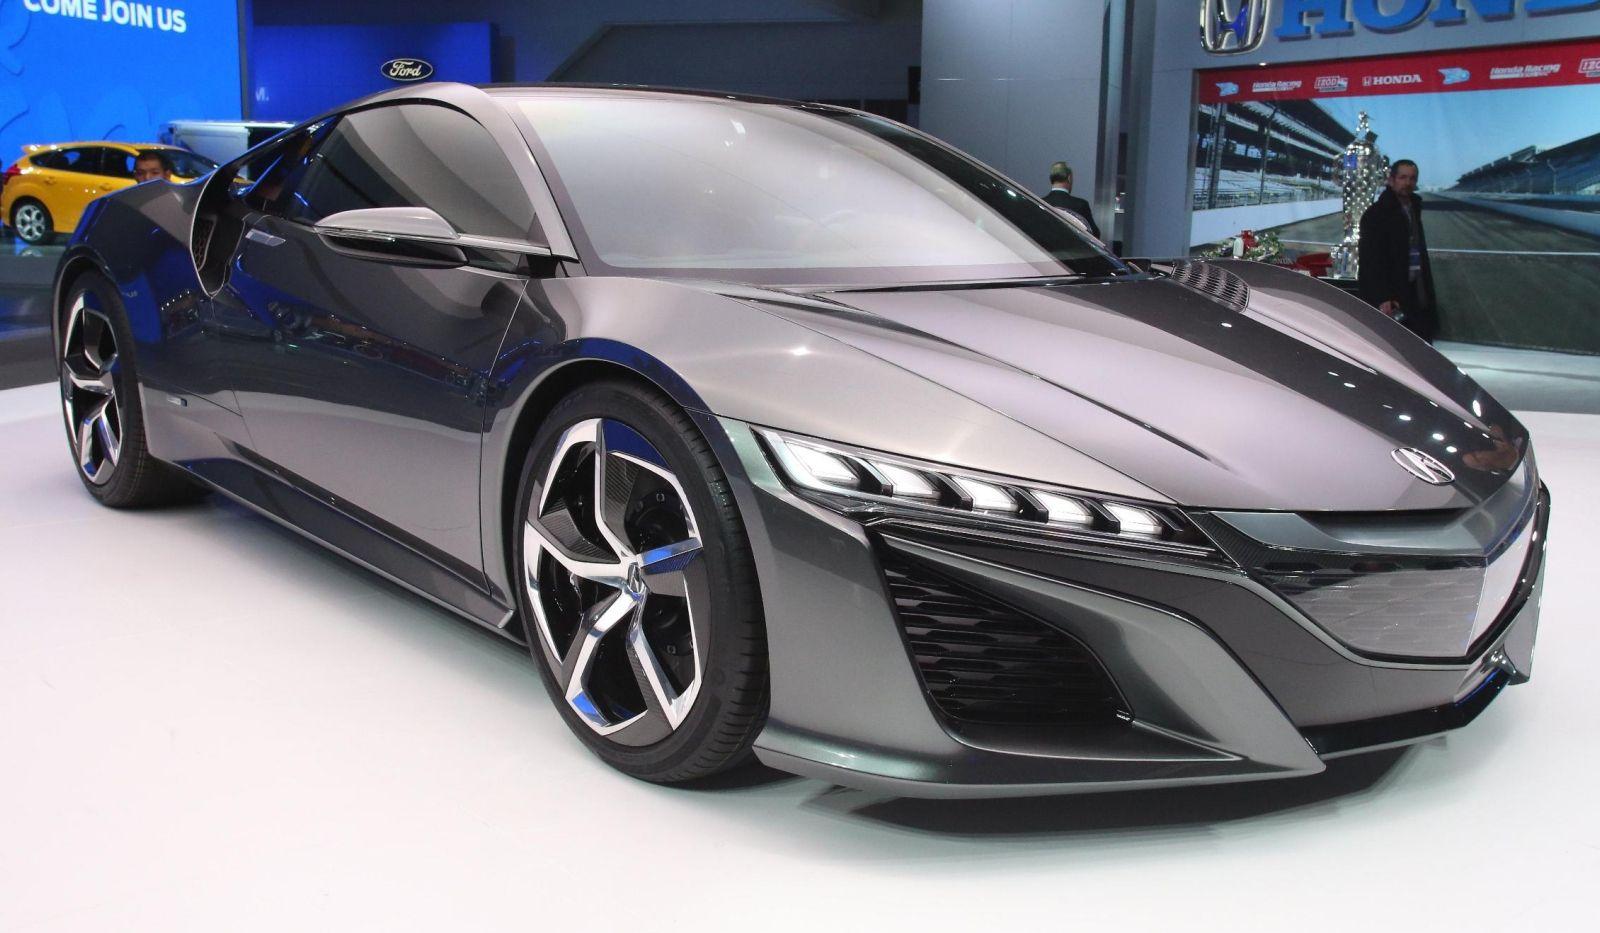 Acura nsx 2015. ) Acura nsx, Acura cars, Acura sports car